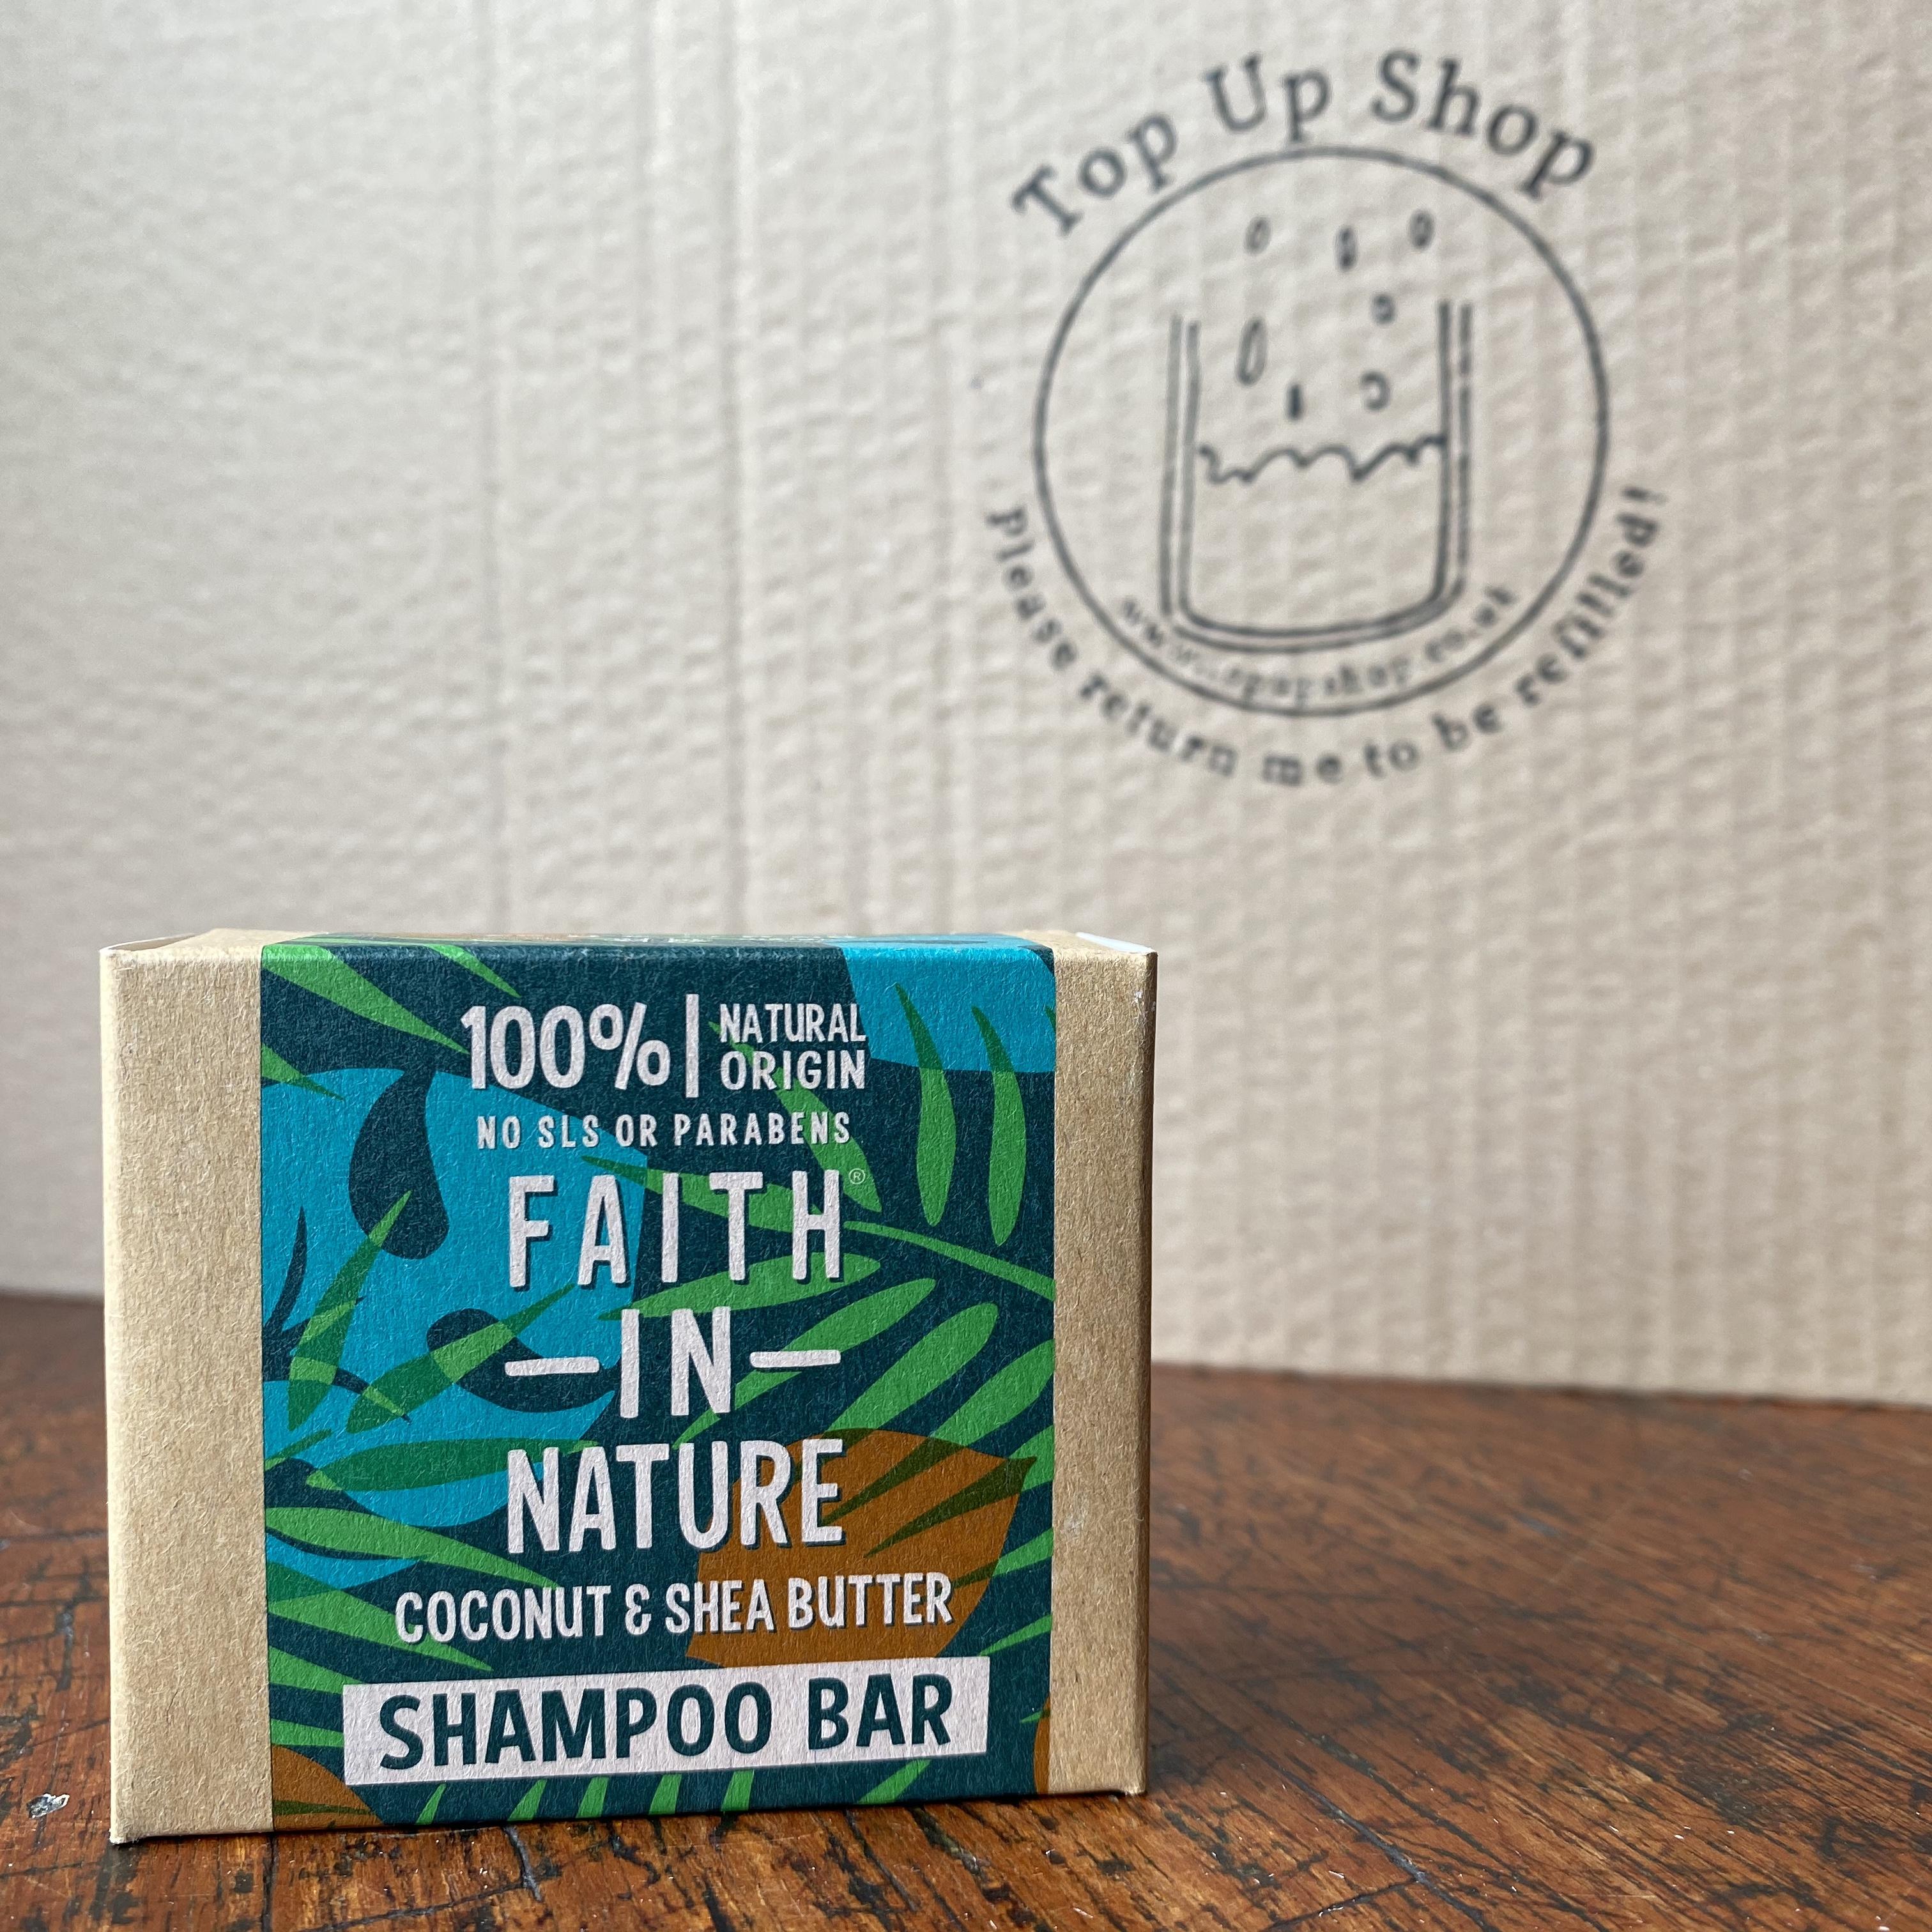 Faith in Nature Shampoo Bars